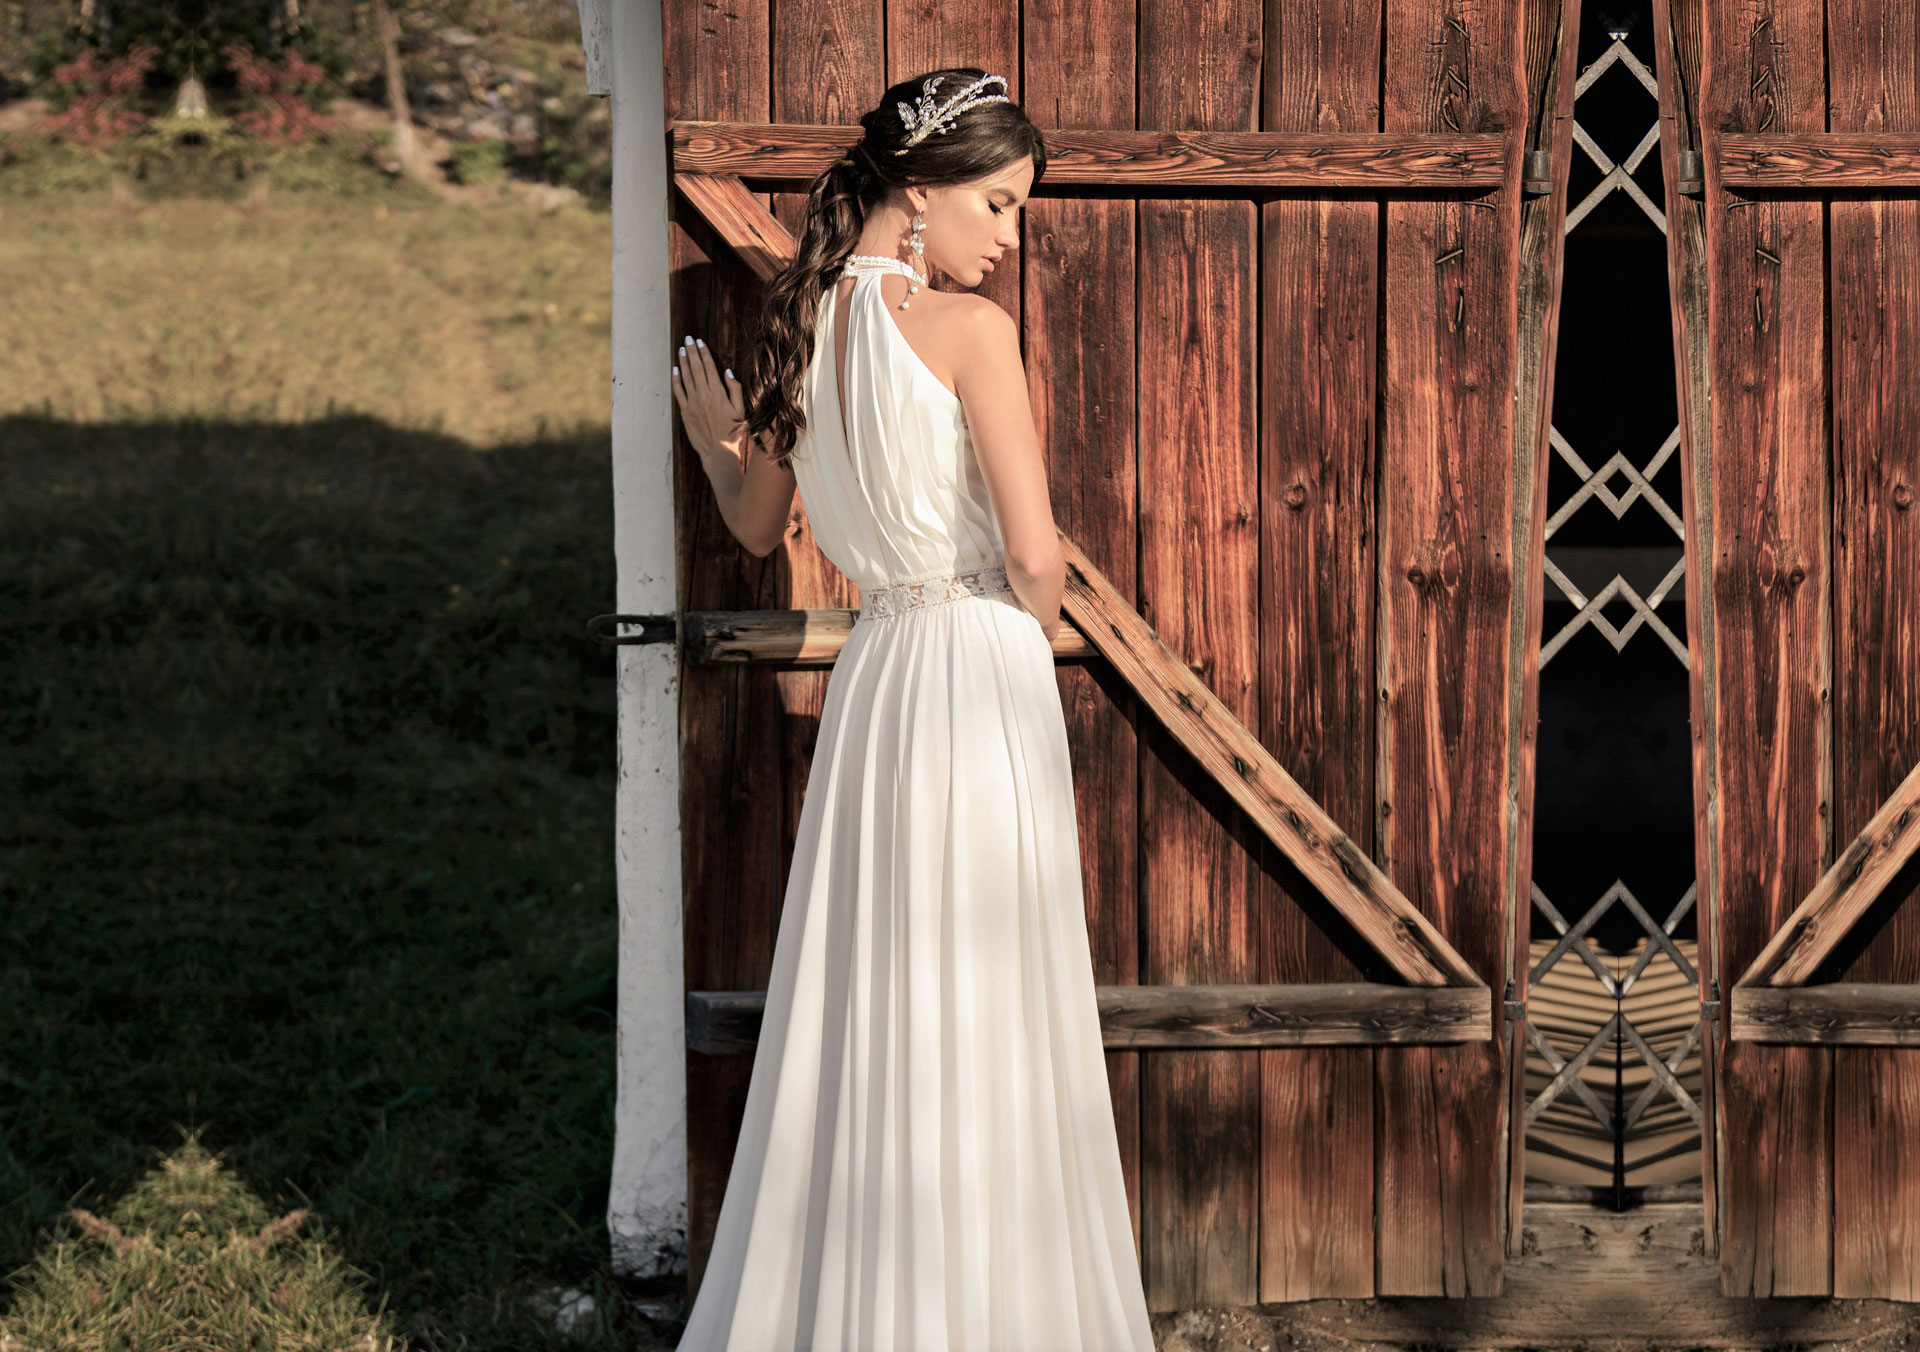 Vintage Brautkleid, Boho Hochzeitskleid